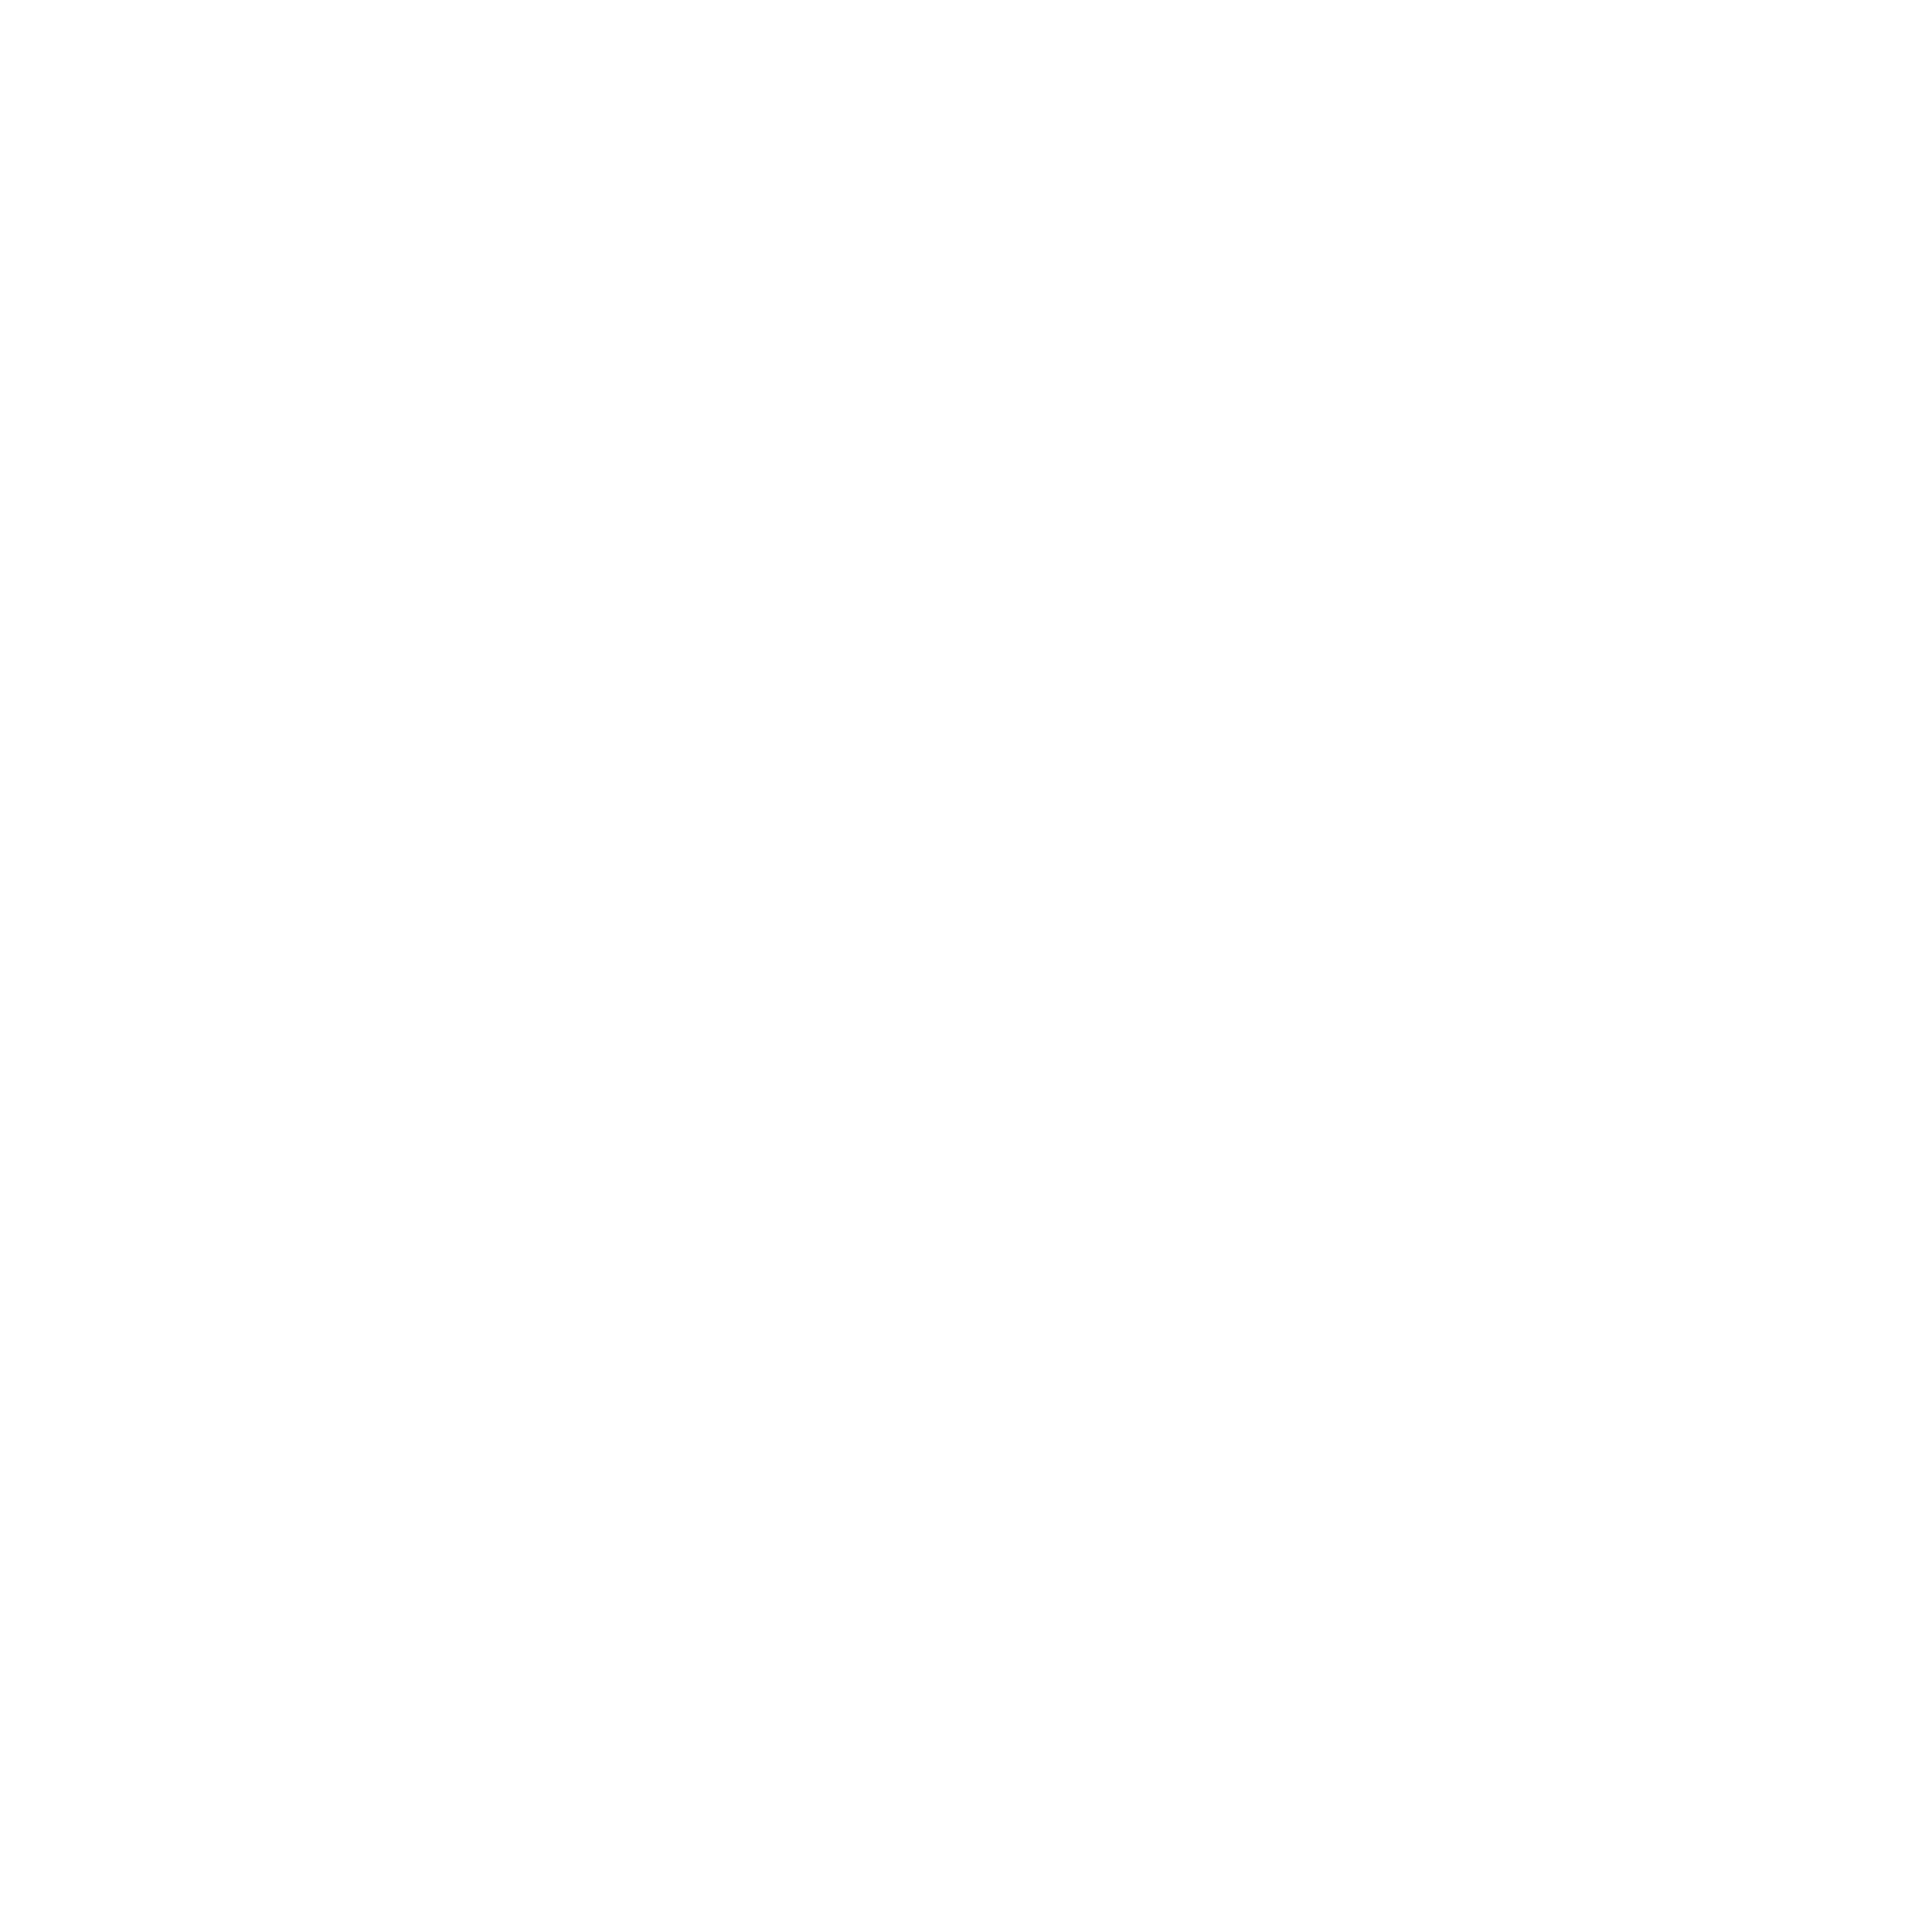 Vehicle storage at Vault Self Storage in Holland Landing, Ontario